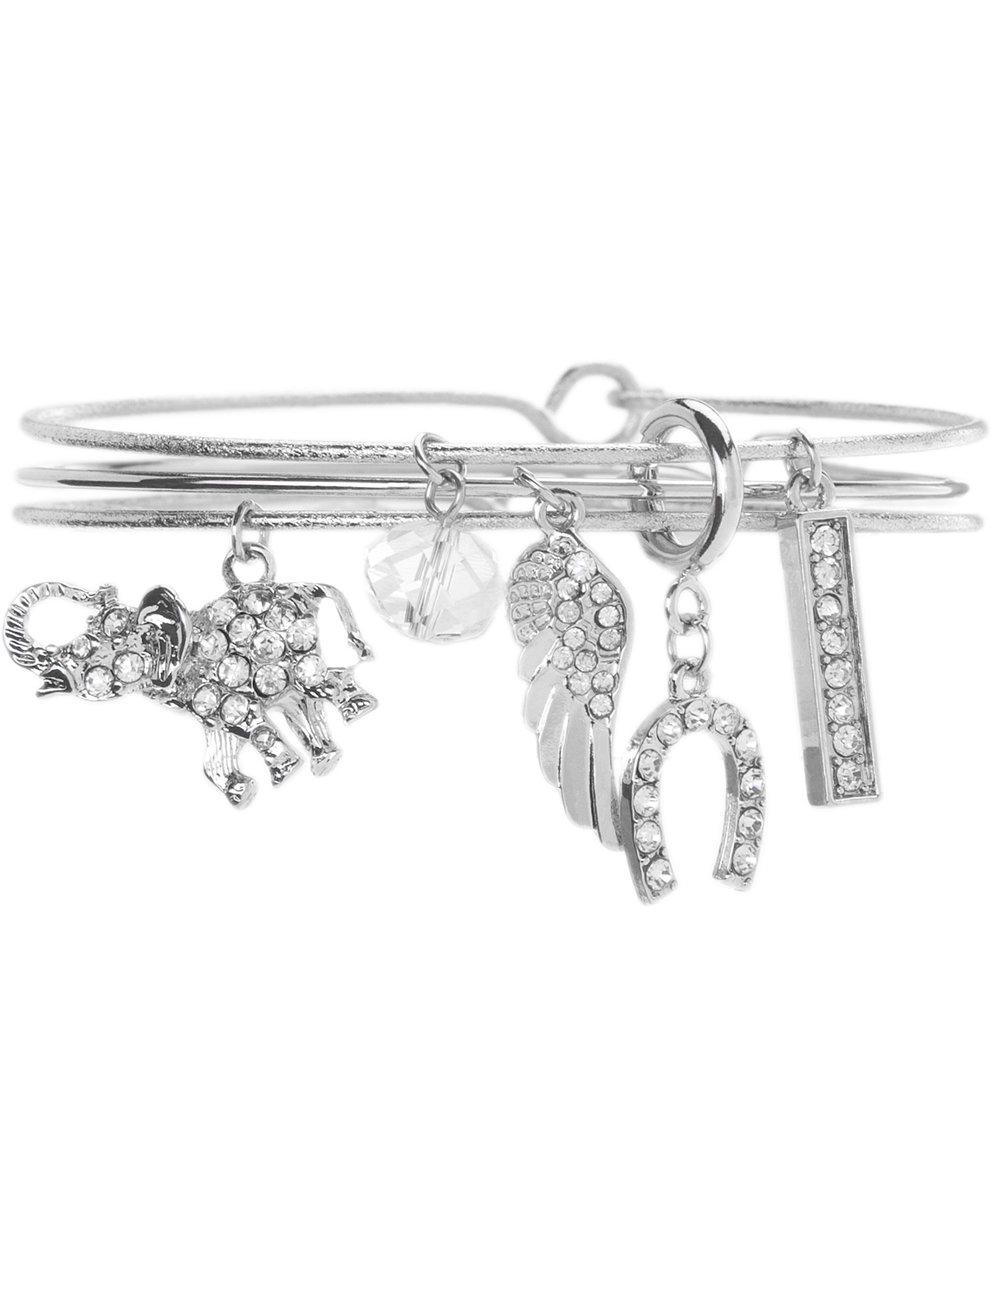 retouched product image of silver charm bangle bracelet with rhinestones